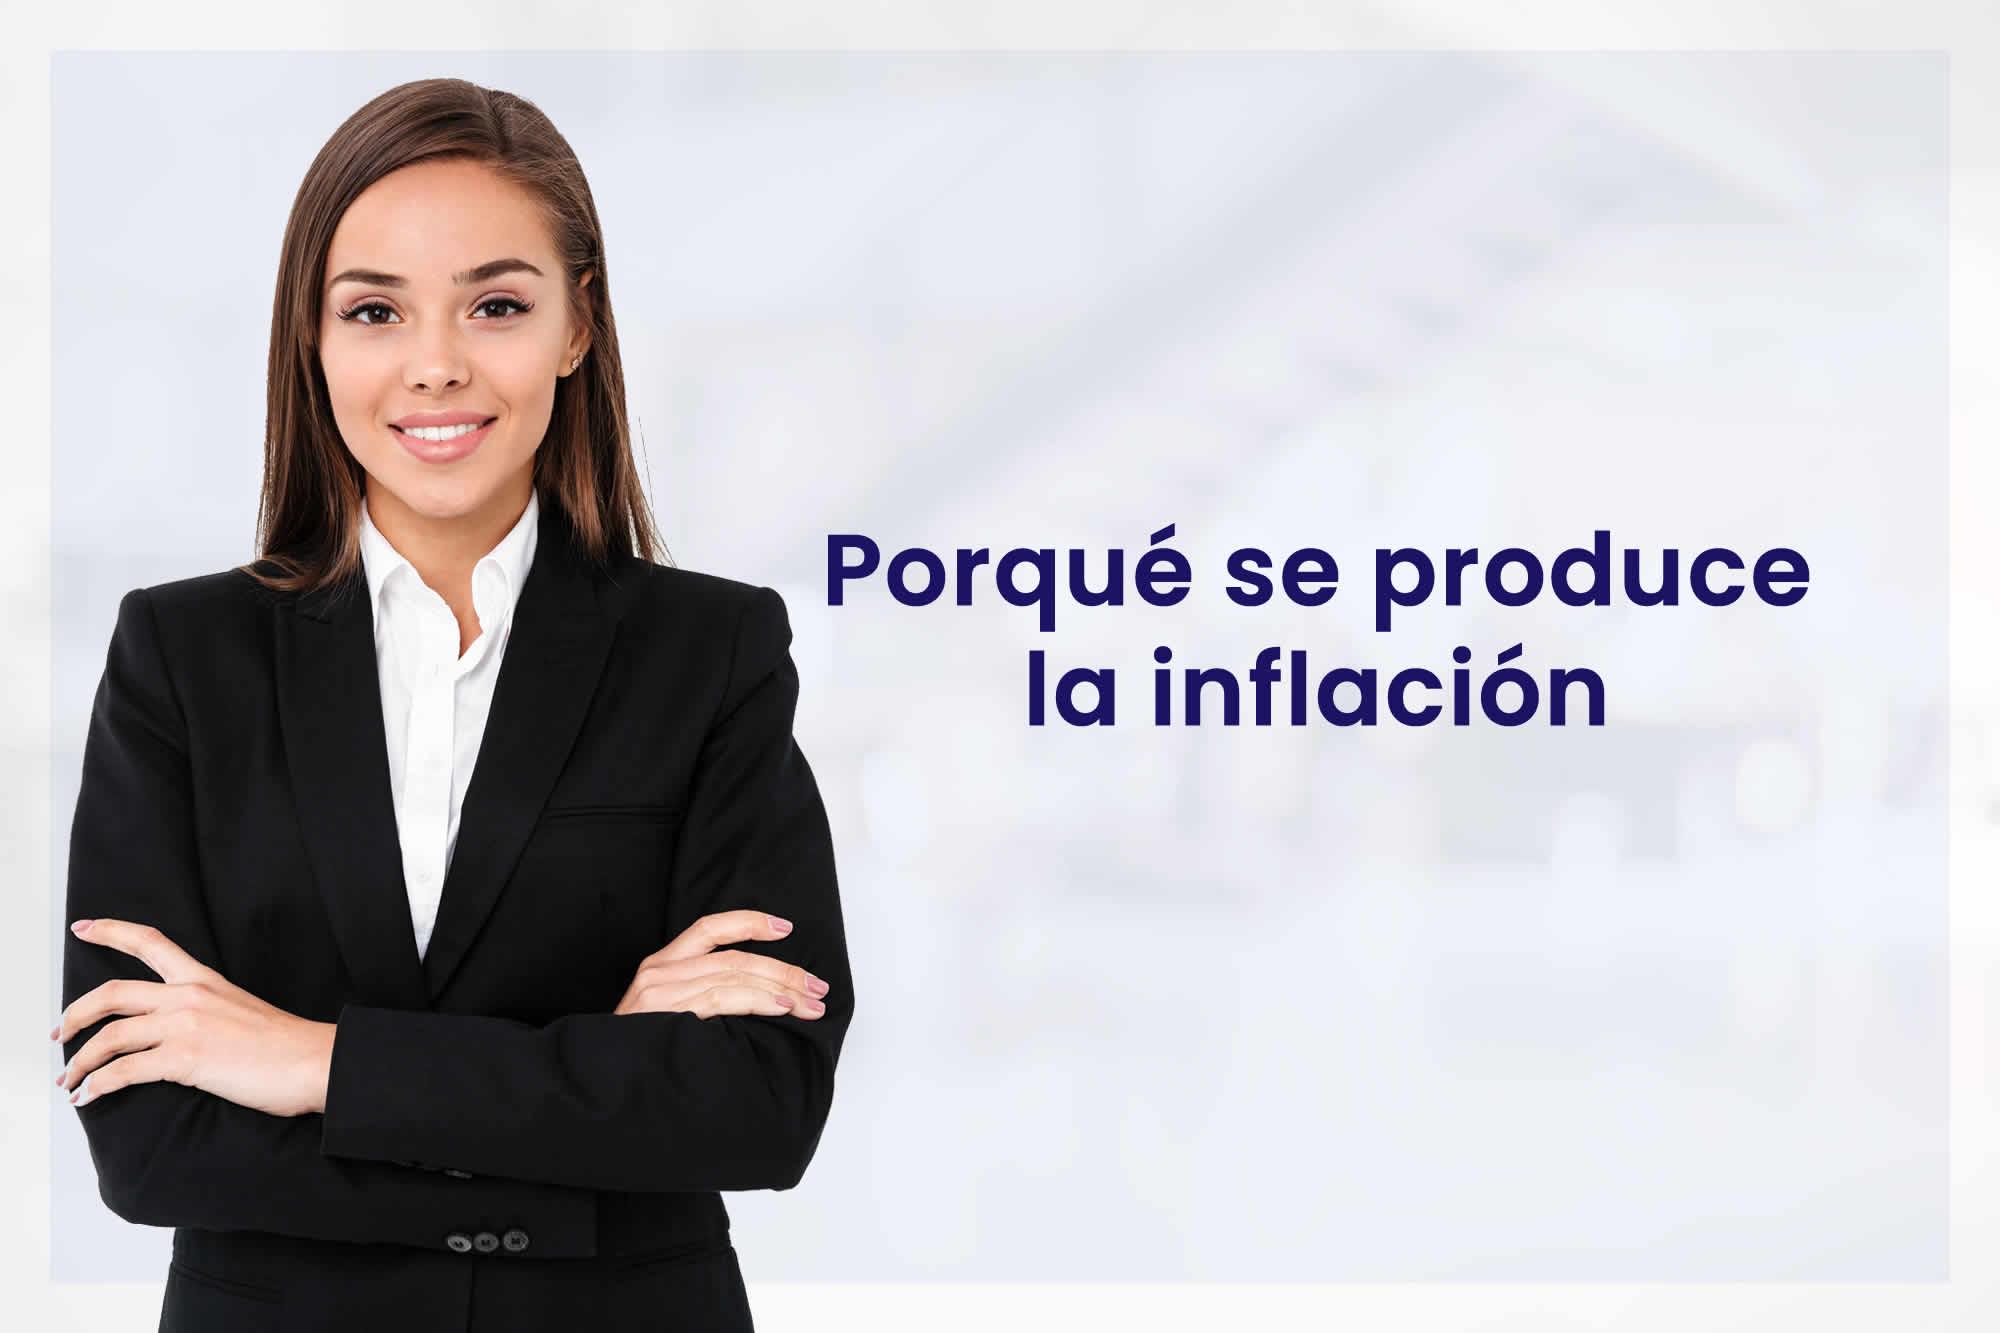 INKARIPERU | PORQUE SE PRODUCE LA INFLACION